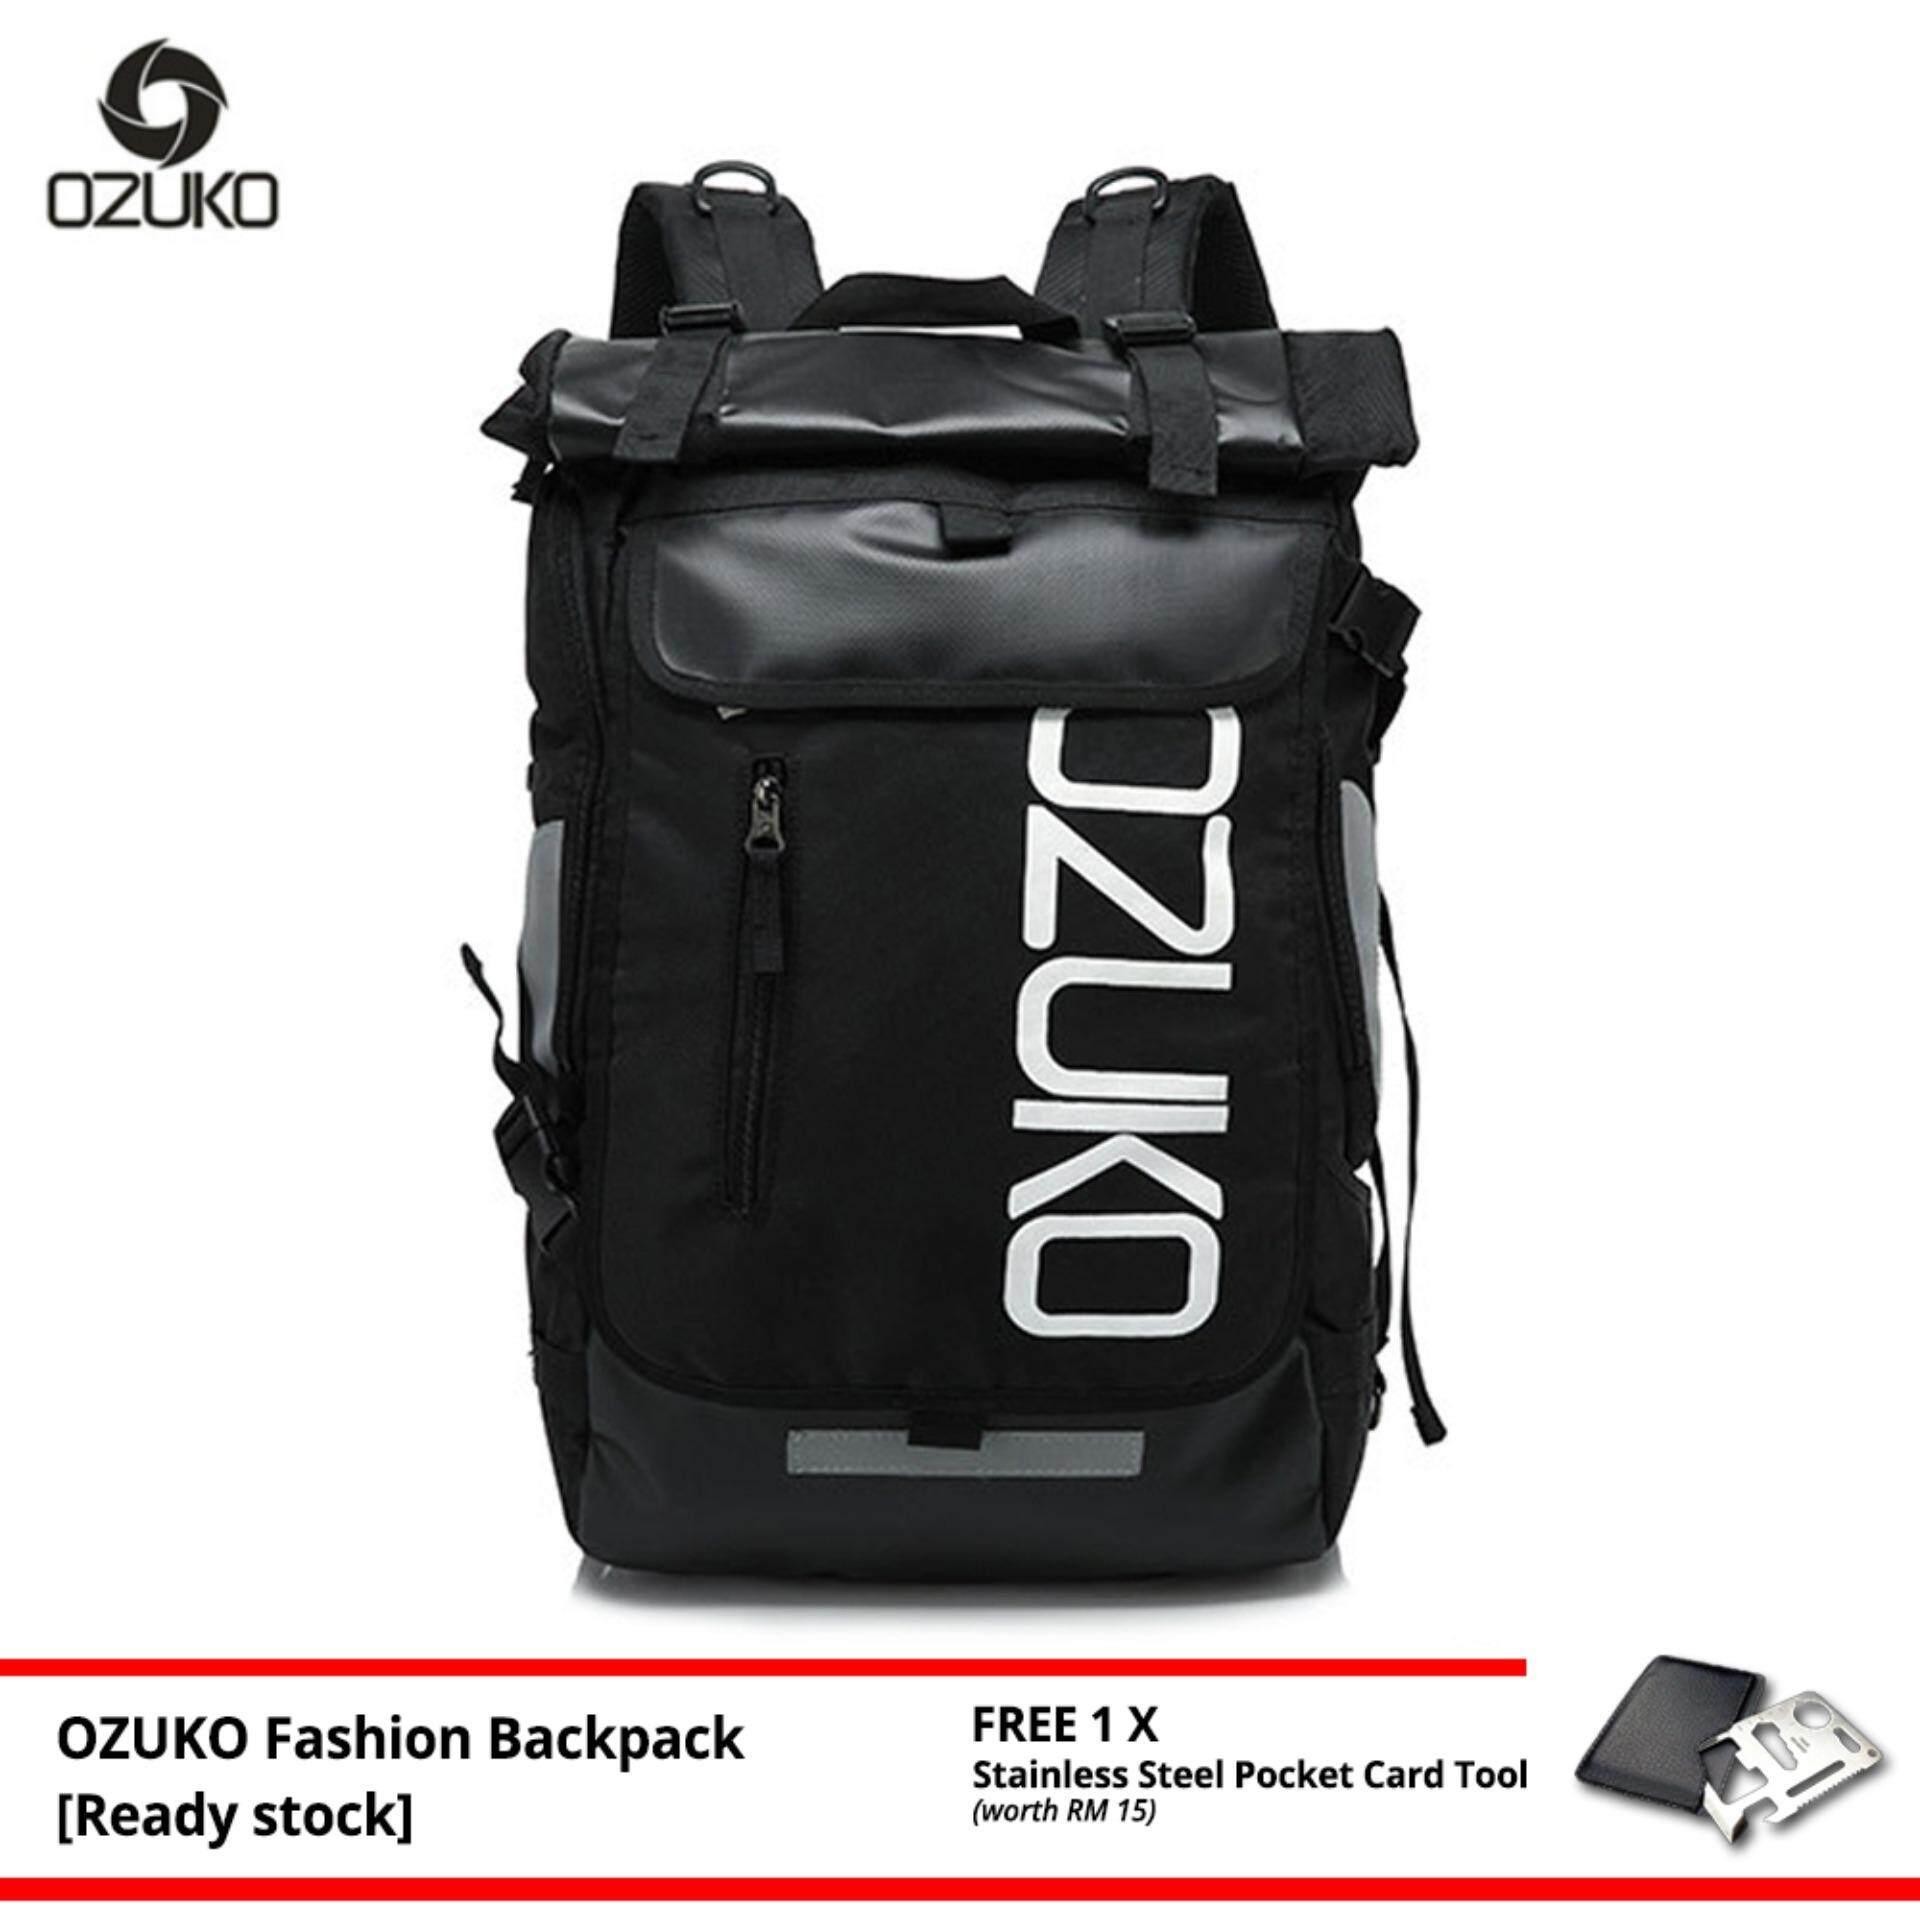 OZUKO Brand New Oxford Backpack Fashion Laptop Bag Casual Waterproof Travel Korean Style Men Women Bagpack -MI4491